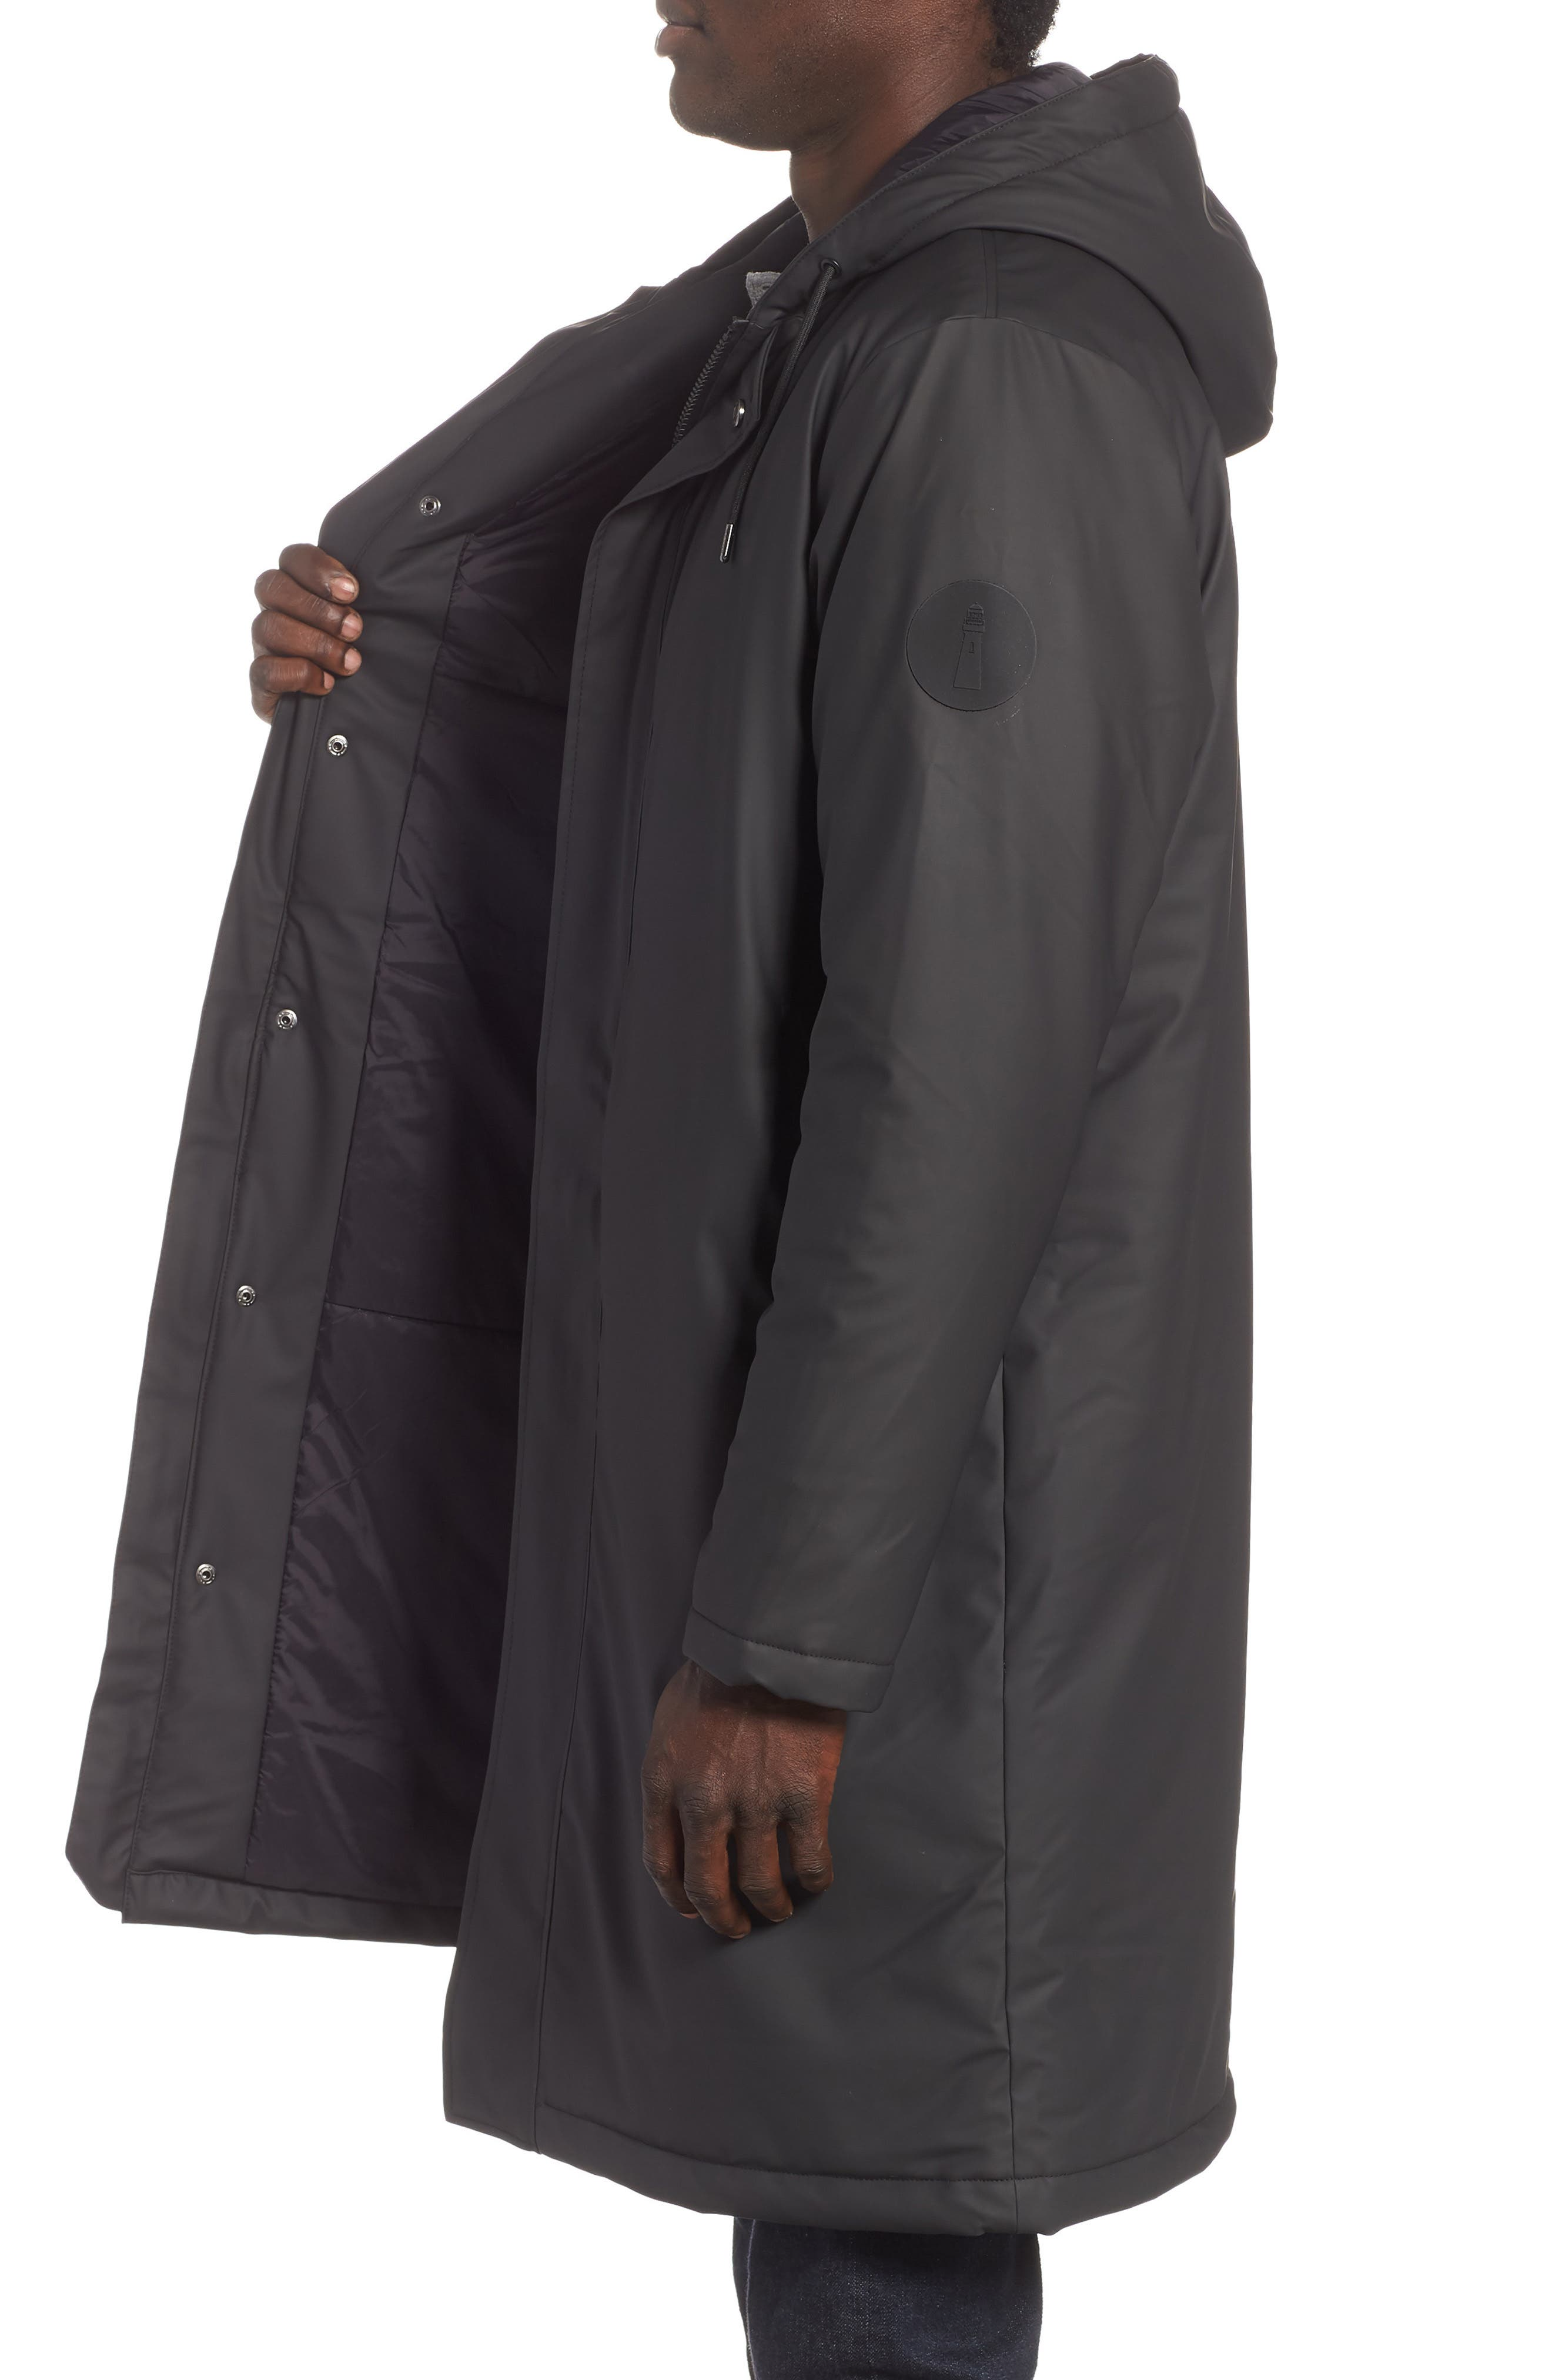 Thermal Hooded Raincoat,                             Alternate thumbnail 3, color,                             BLACK